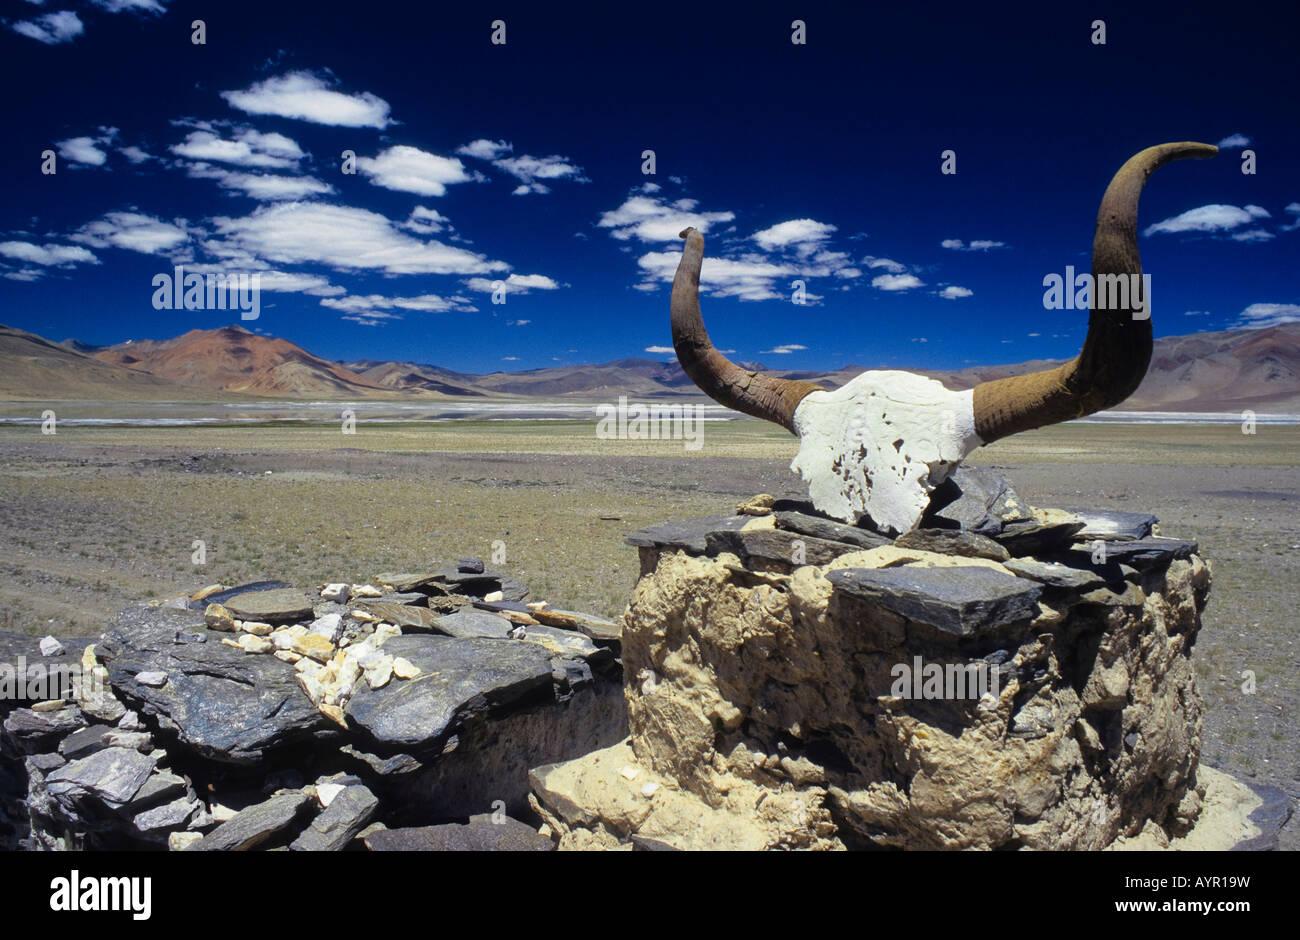 Mani inscriptions on a yak skull, Himalayas, Ladakh, India - Stock Image